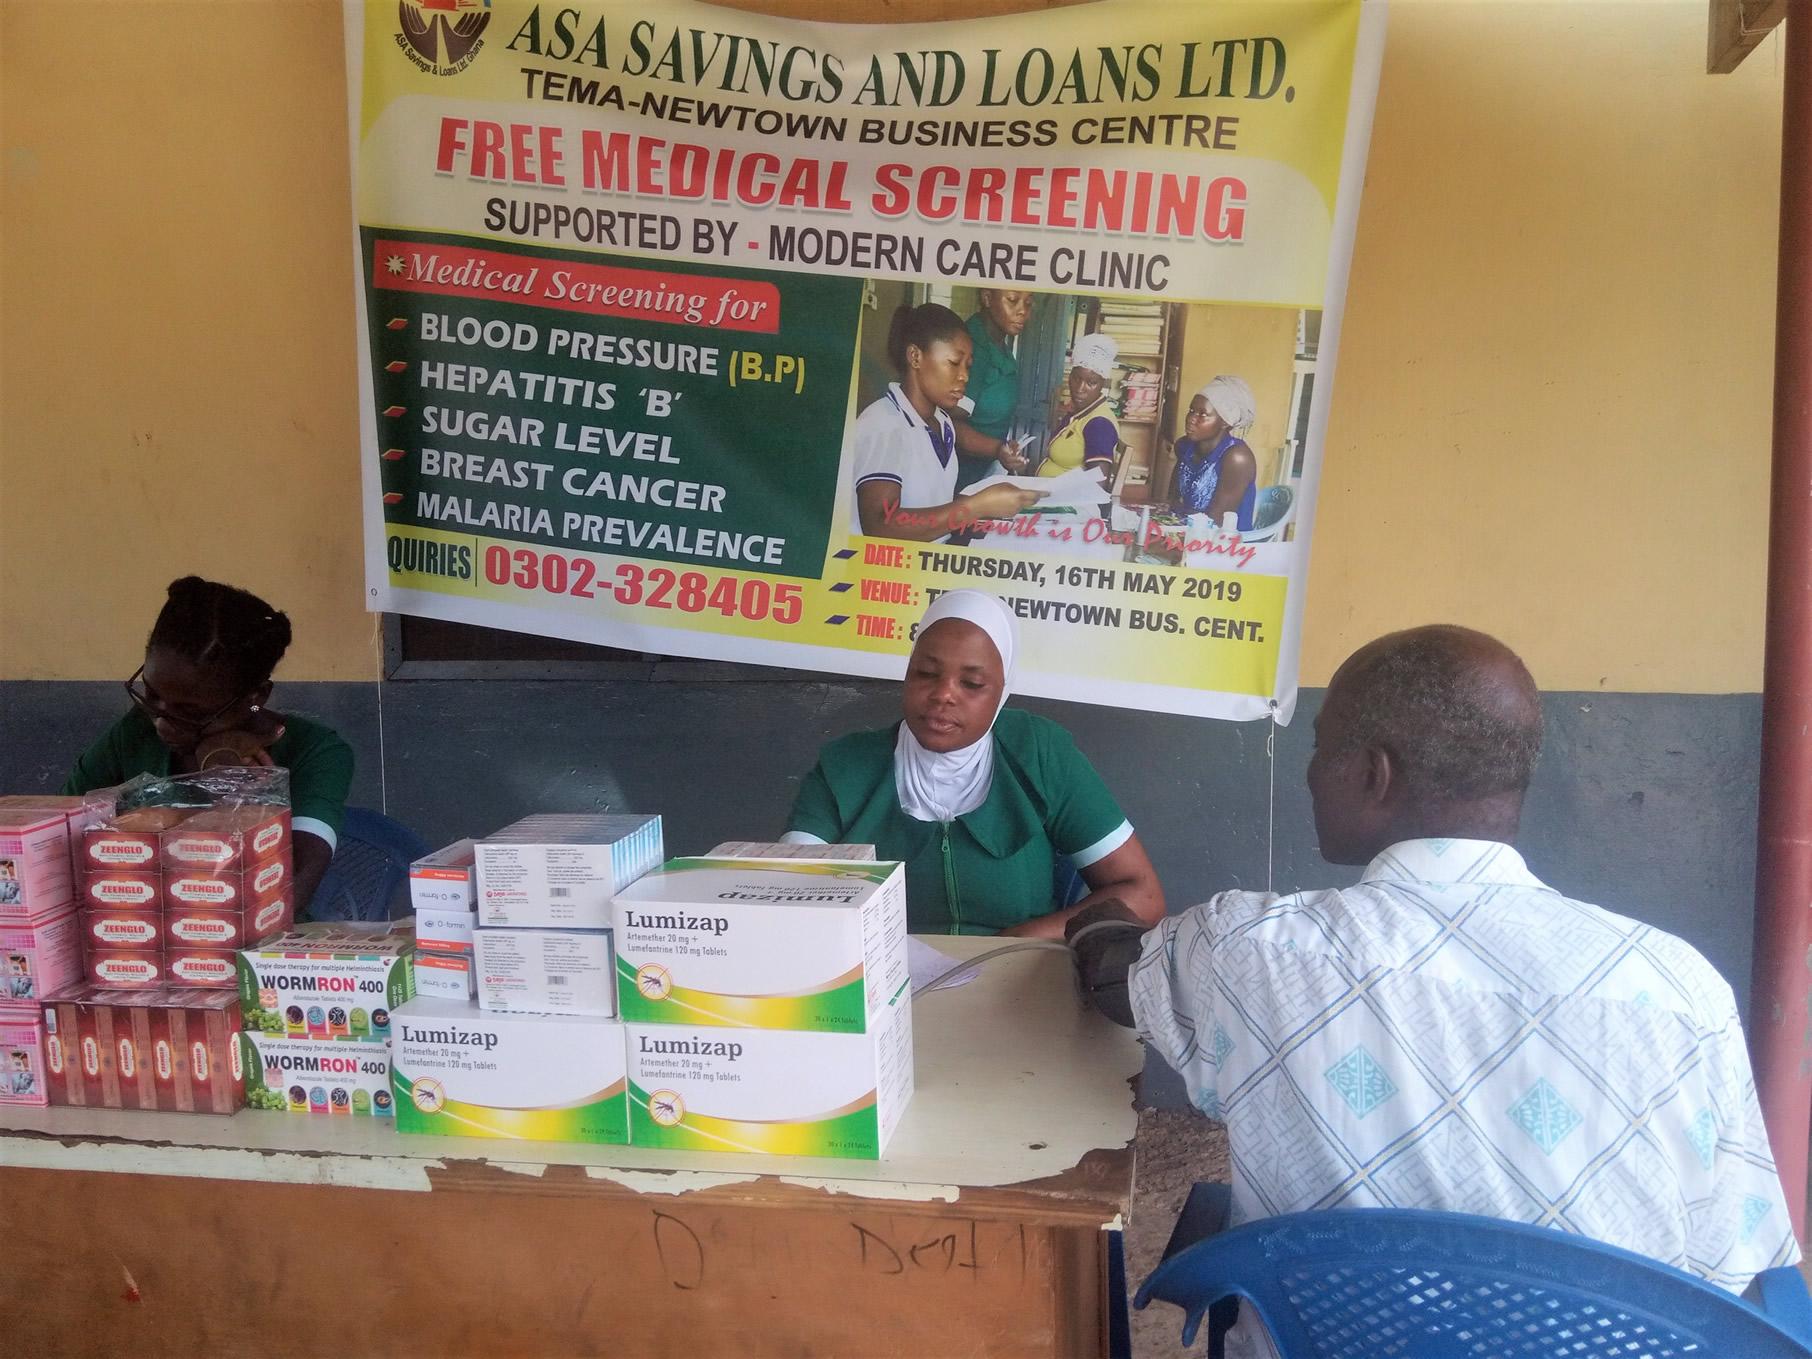 ASA Savings & Loans Organises FMS for Tema New Town and Chantan